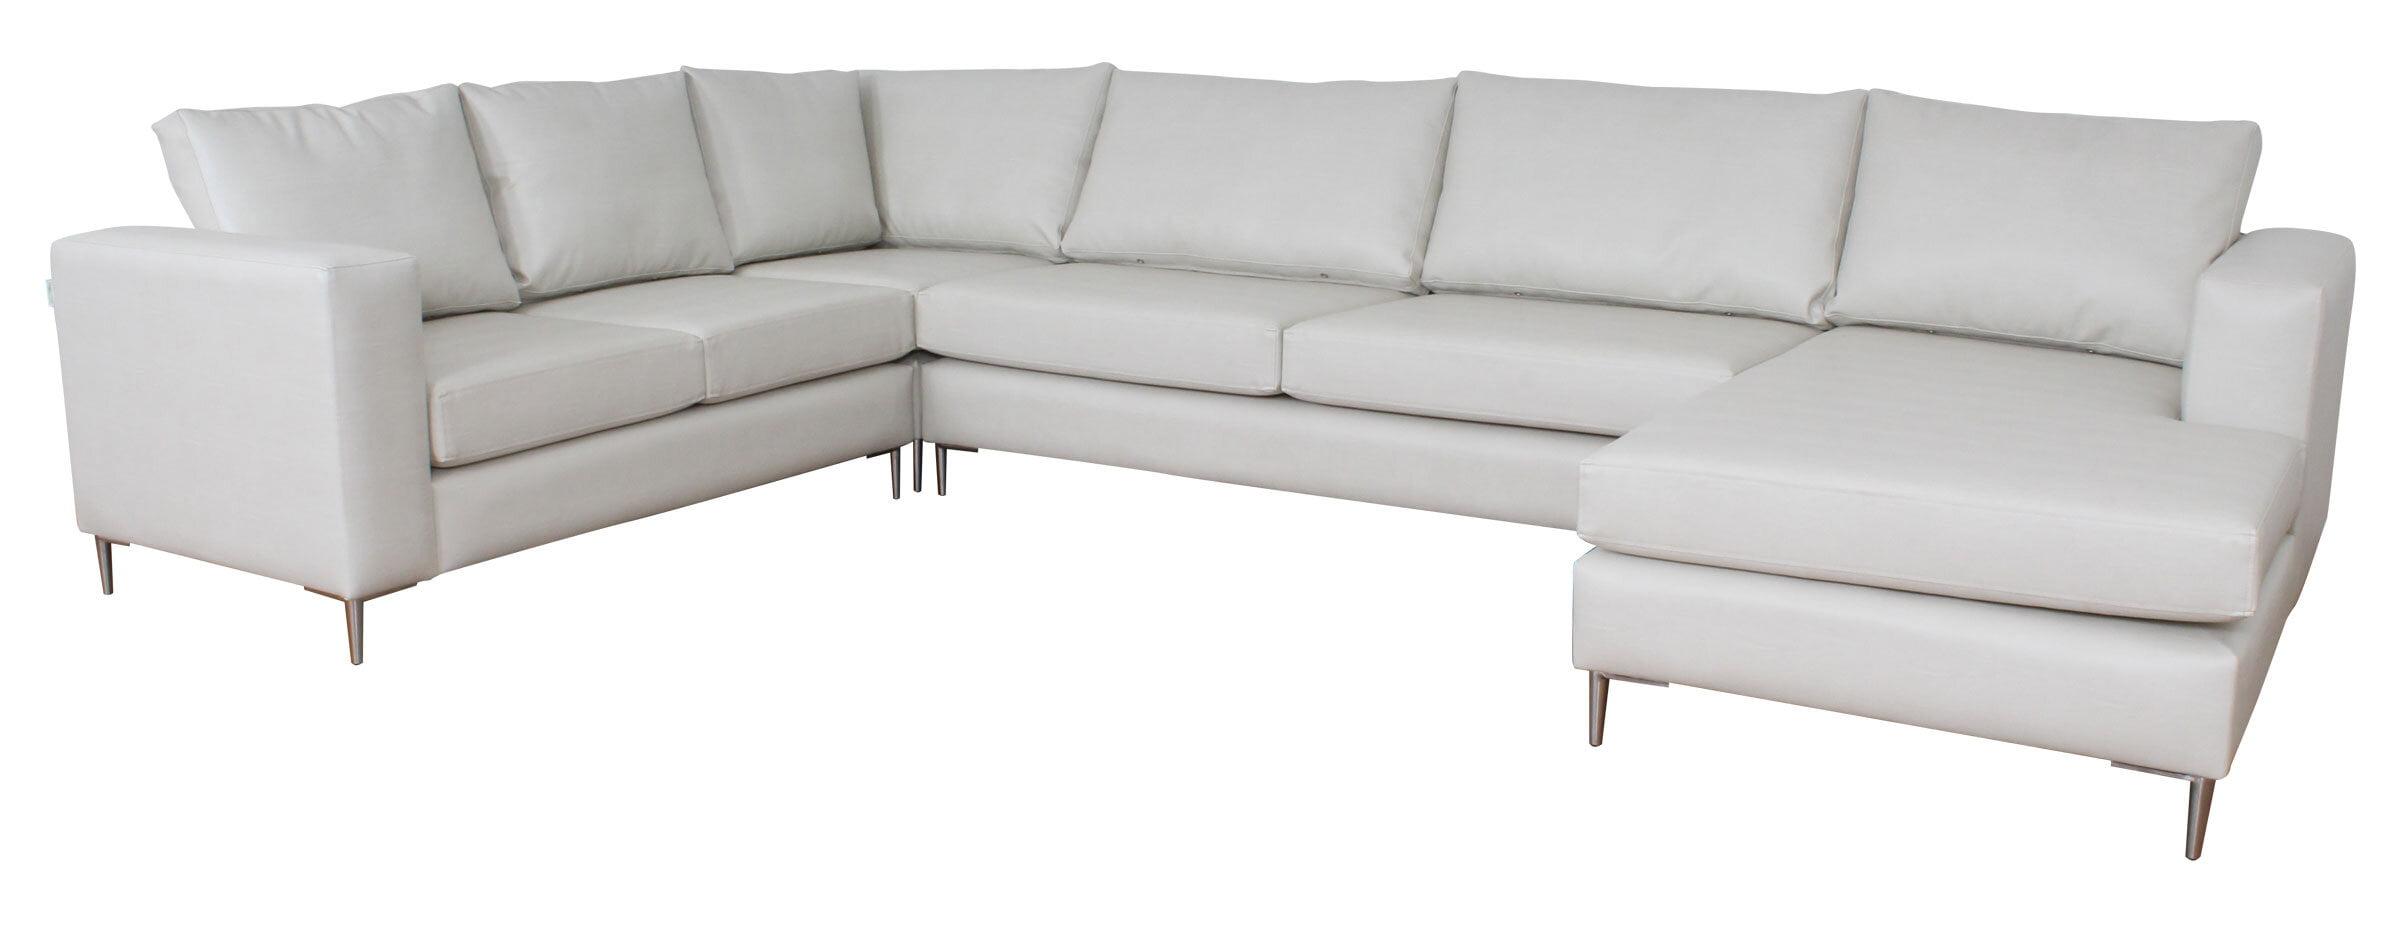 Sofa Modular Chaise Longue Pu Master Best Gelo